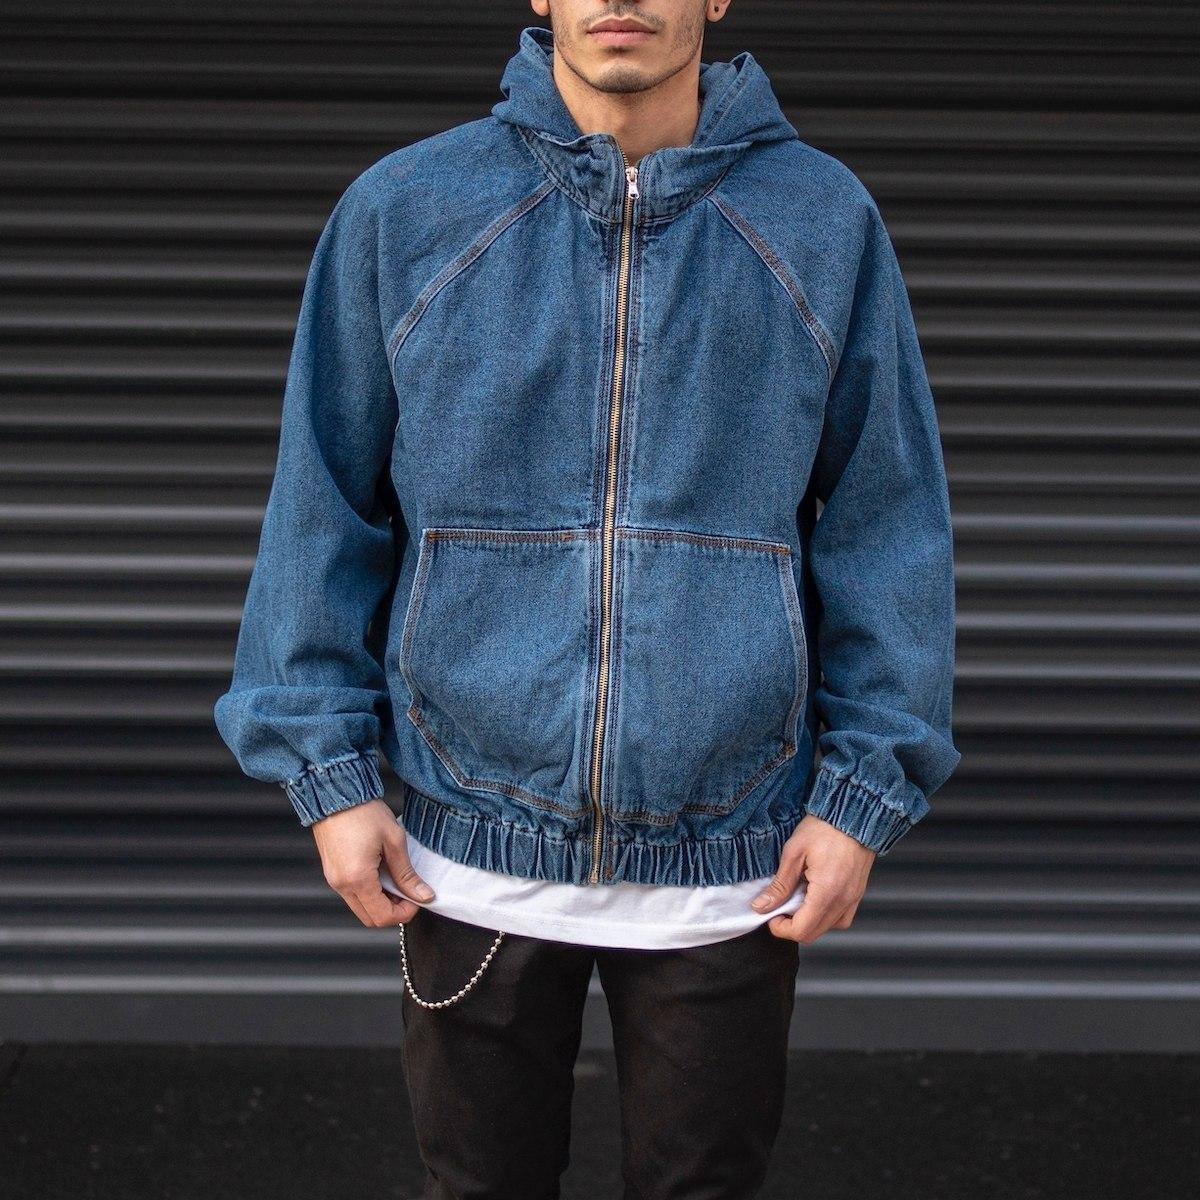 Men's Zipped Denim Jacket In Navy Blue